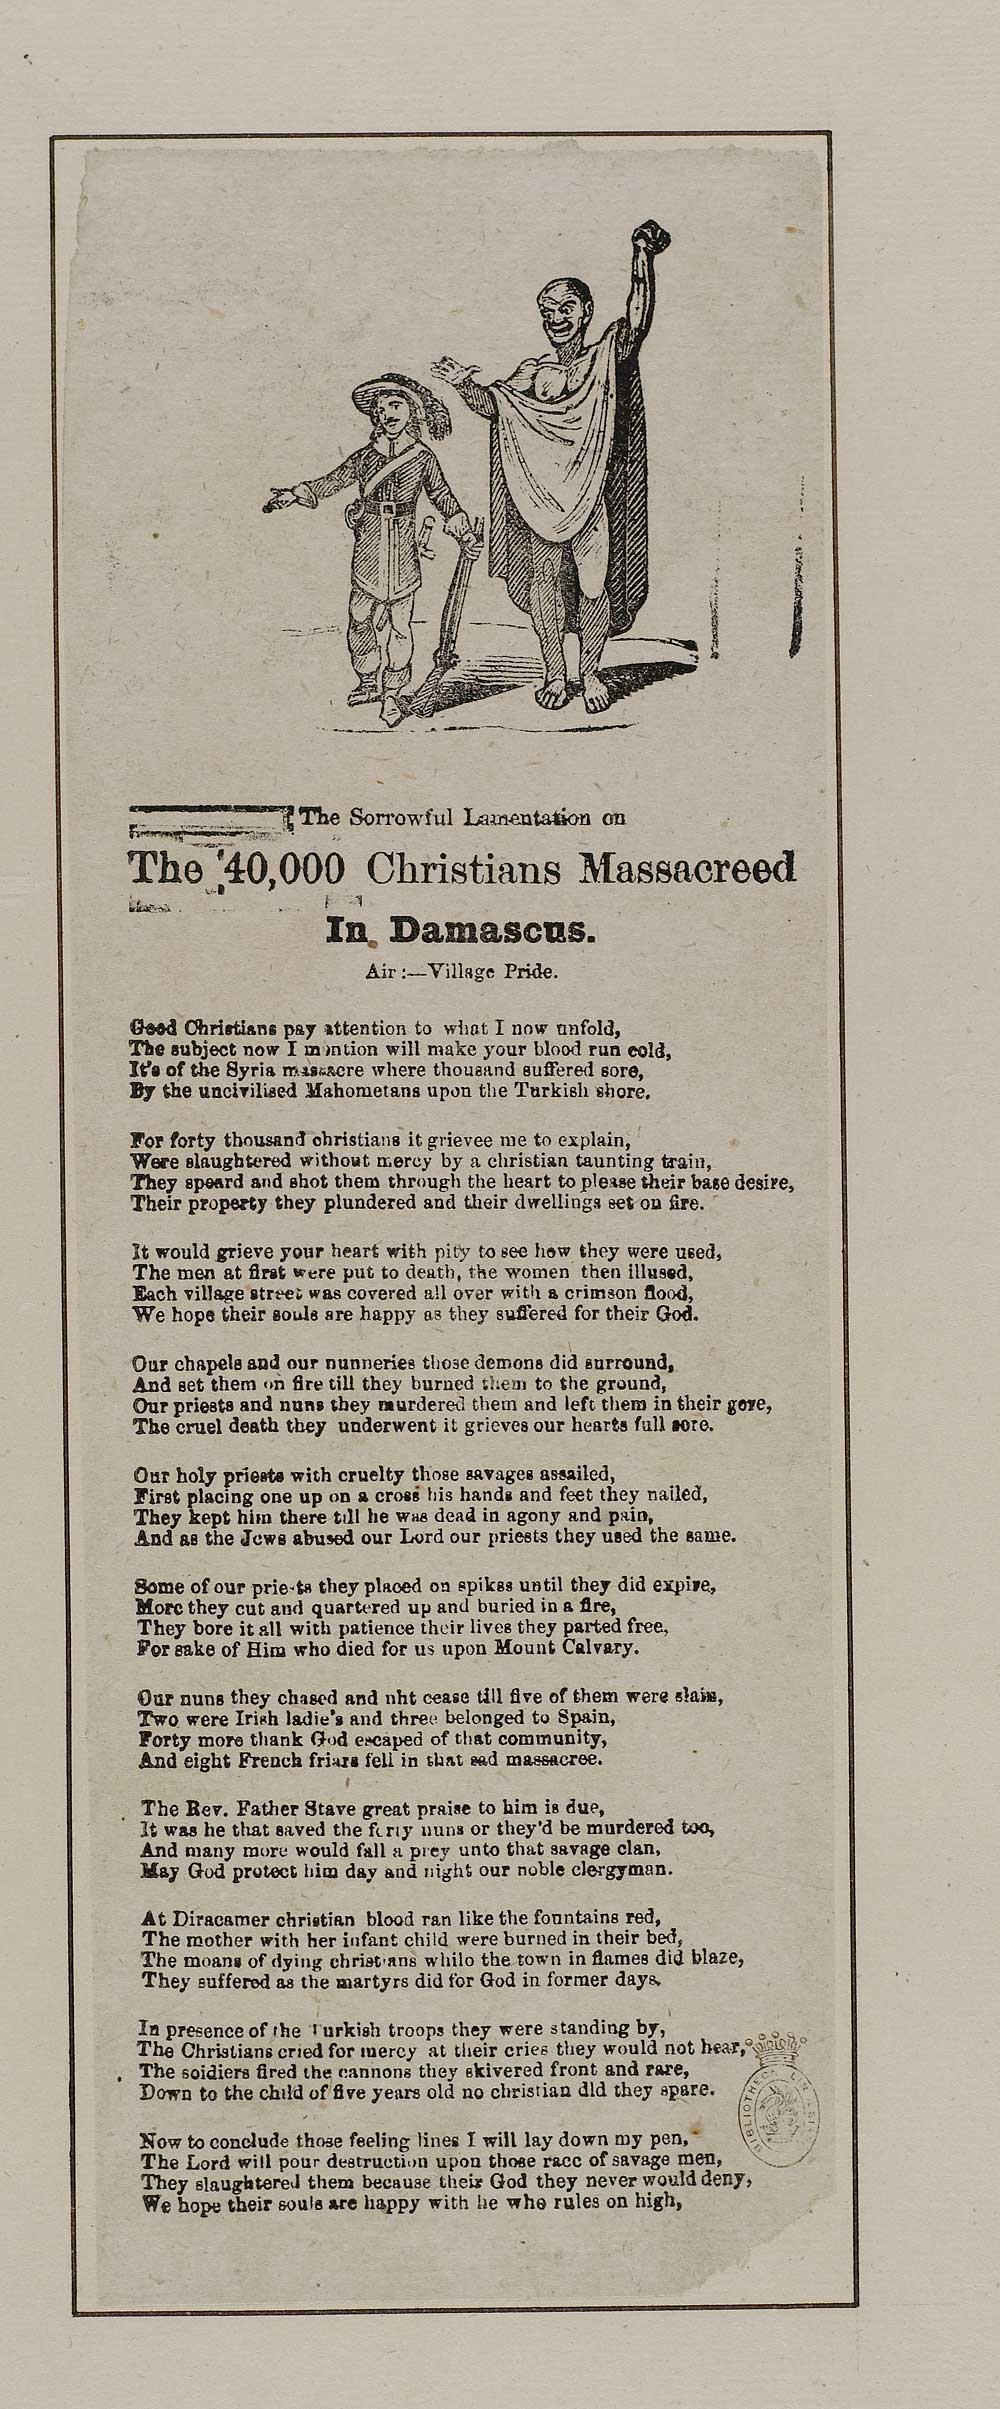 Sorrowful Lamentation On The 40 000 Christians Massacreed